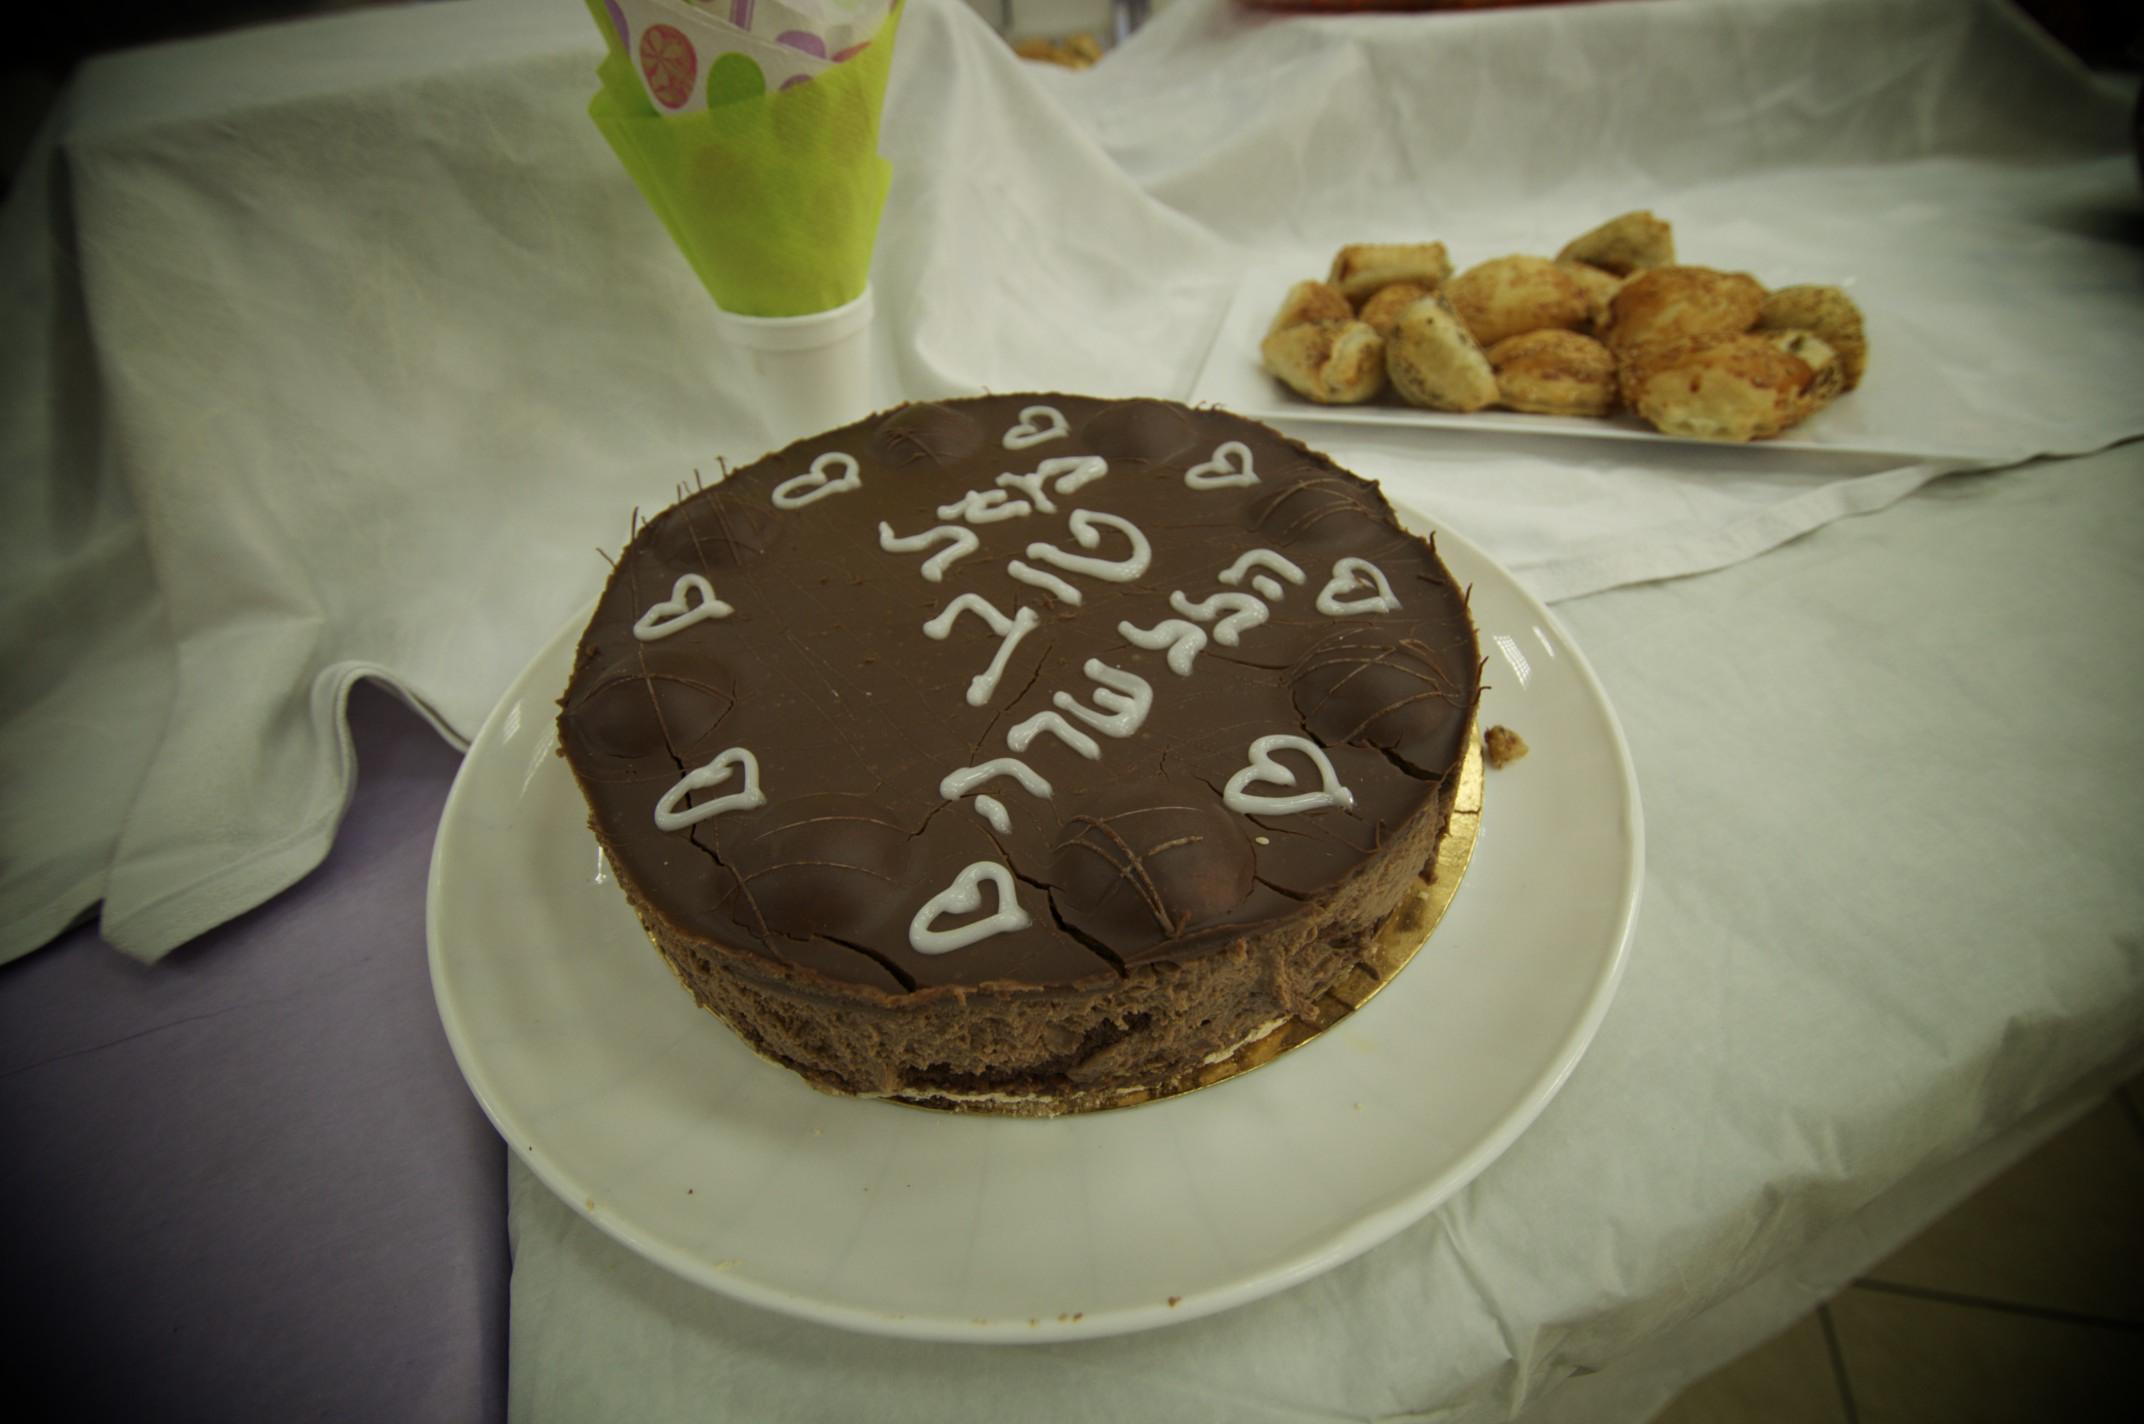 Halleli's Simchat Bat cake